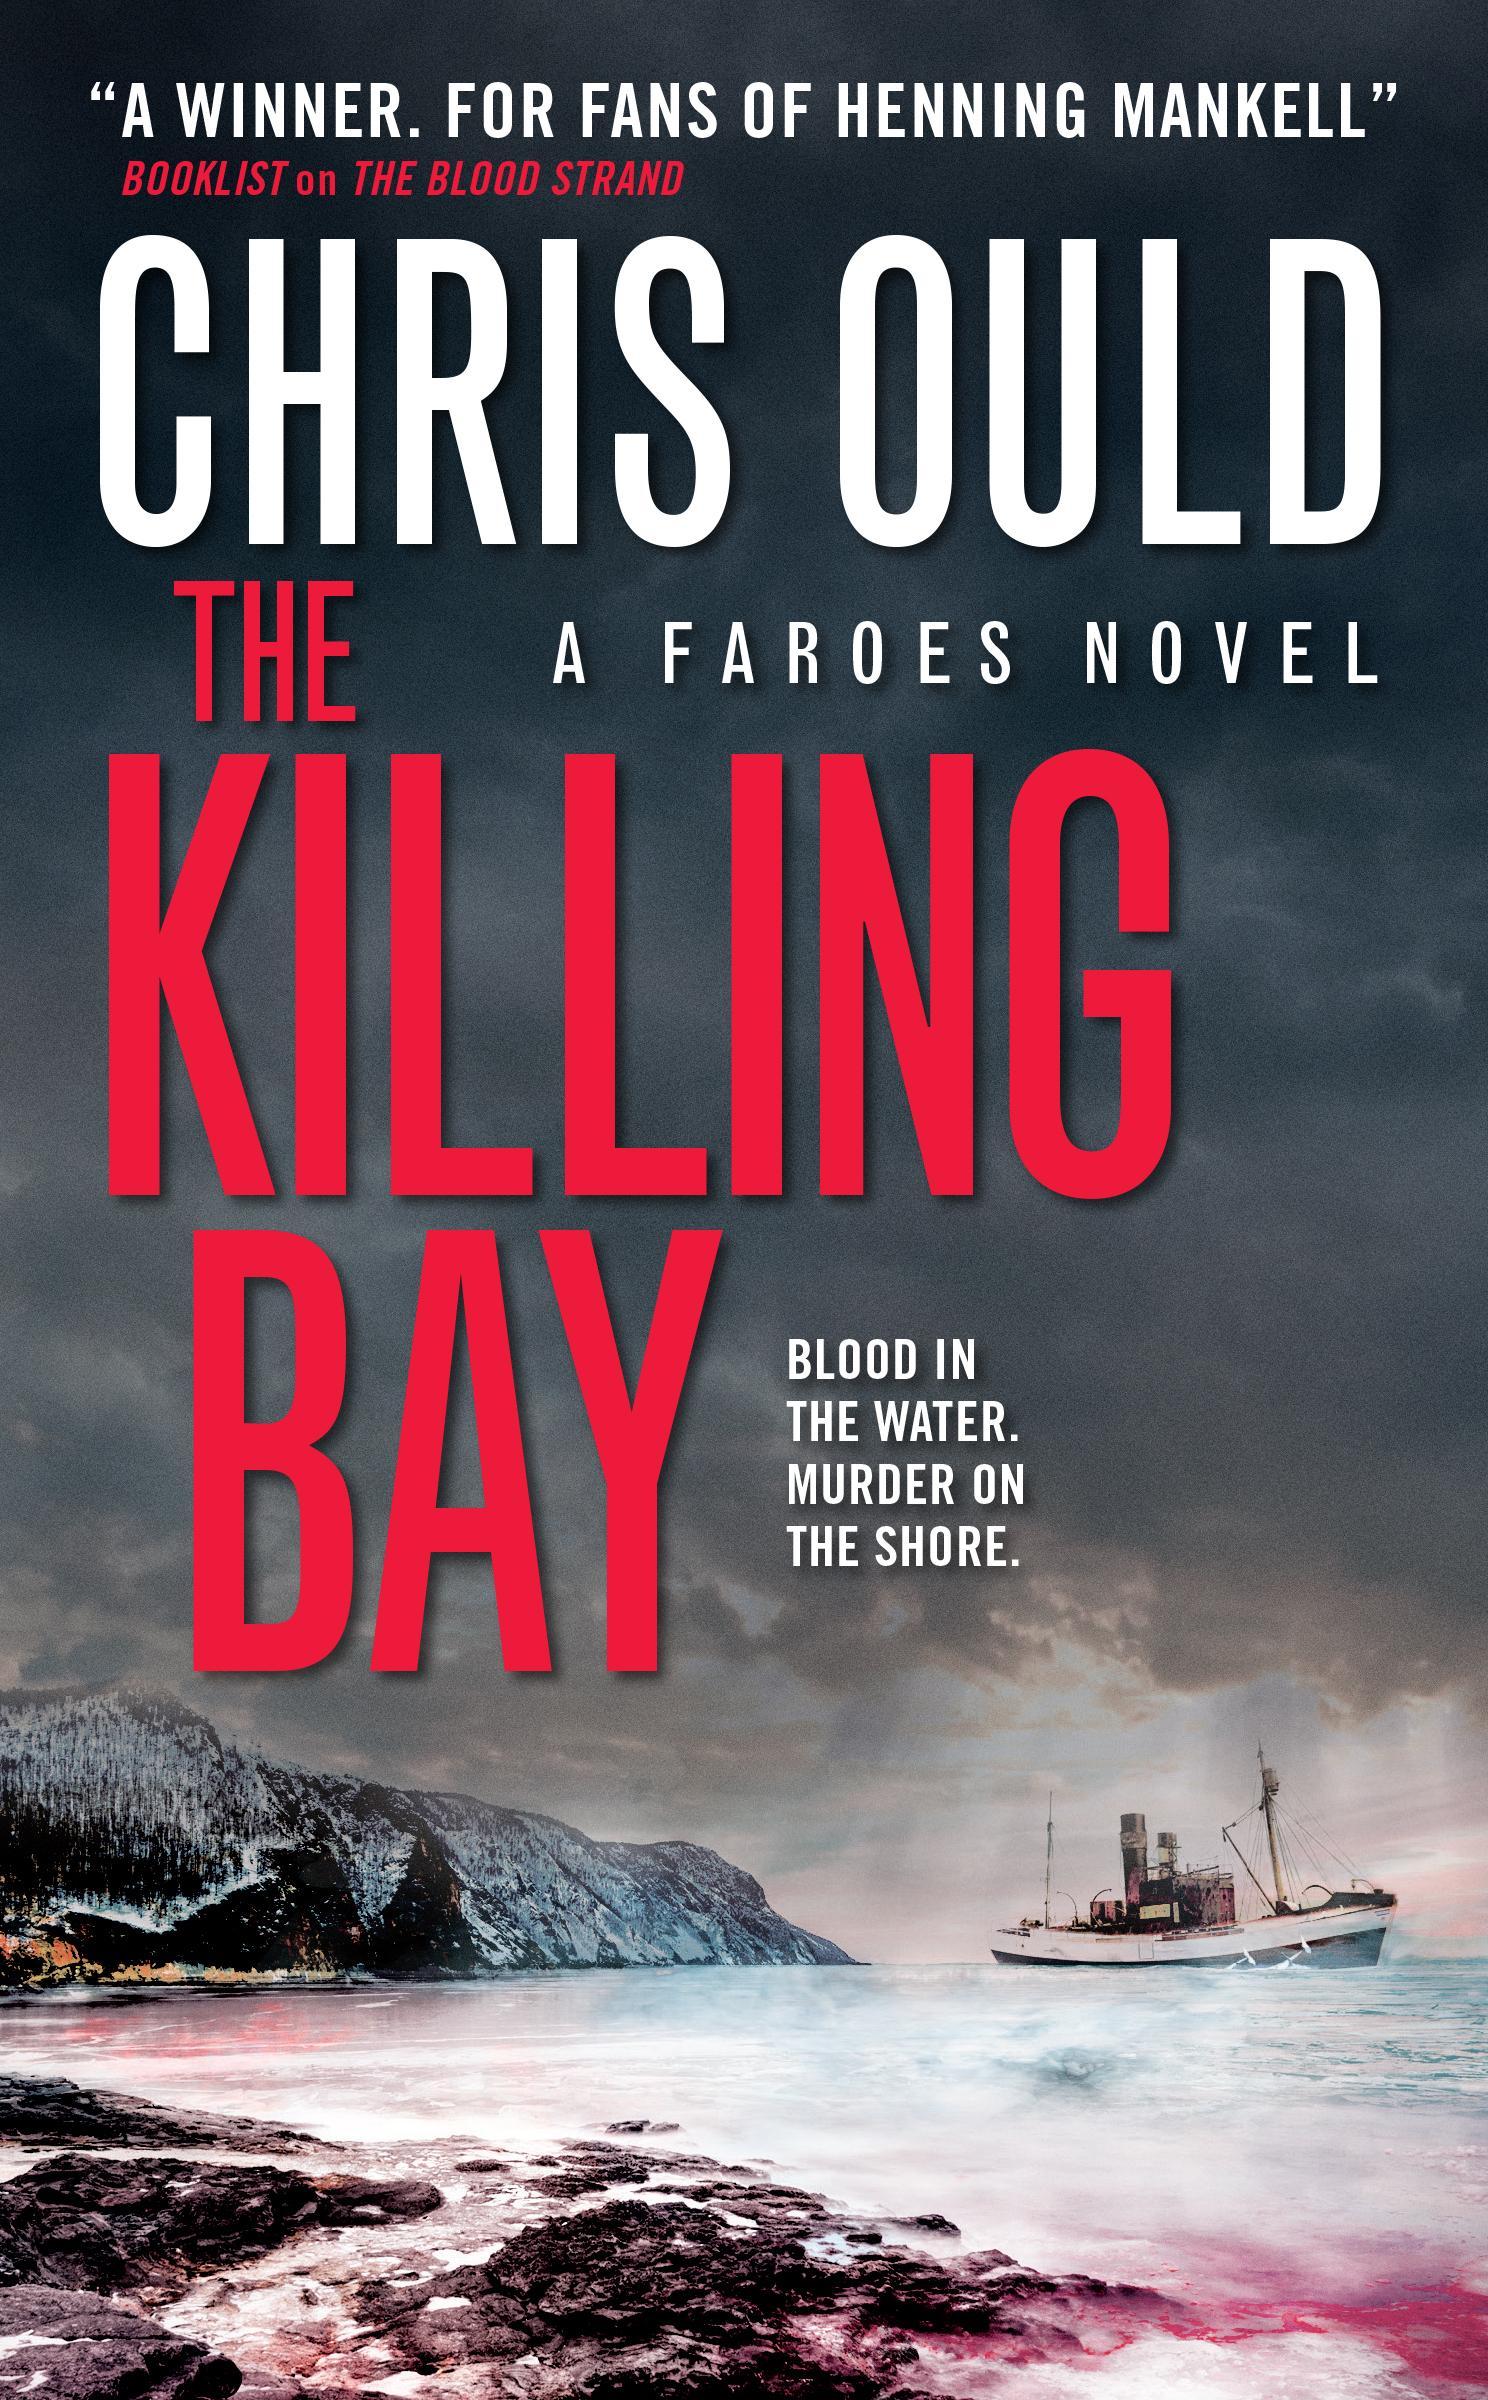 The Killing Bay (Faroes novel #2) mcmahon j the winter people a novel